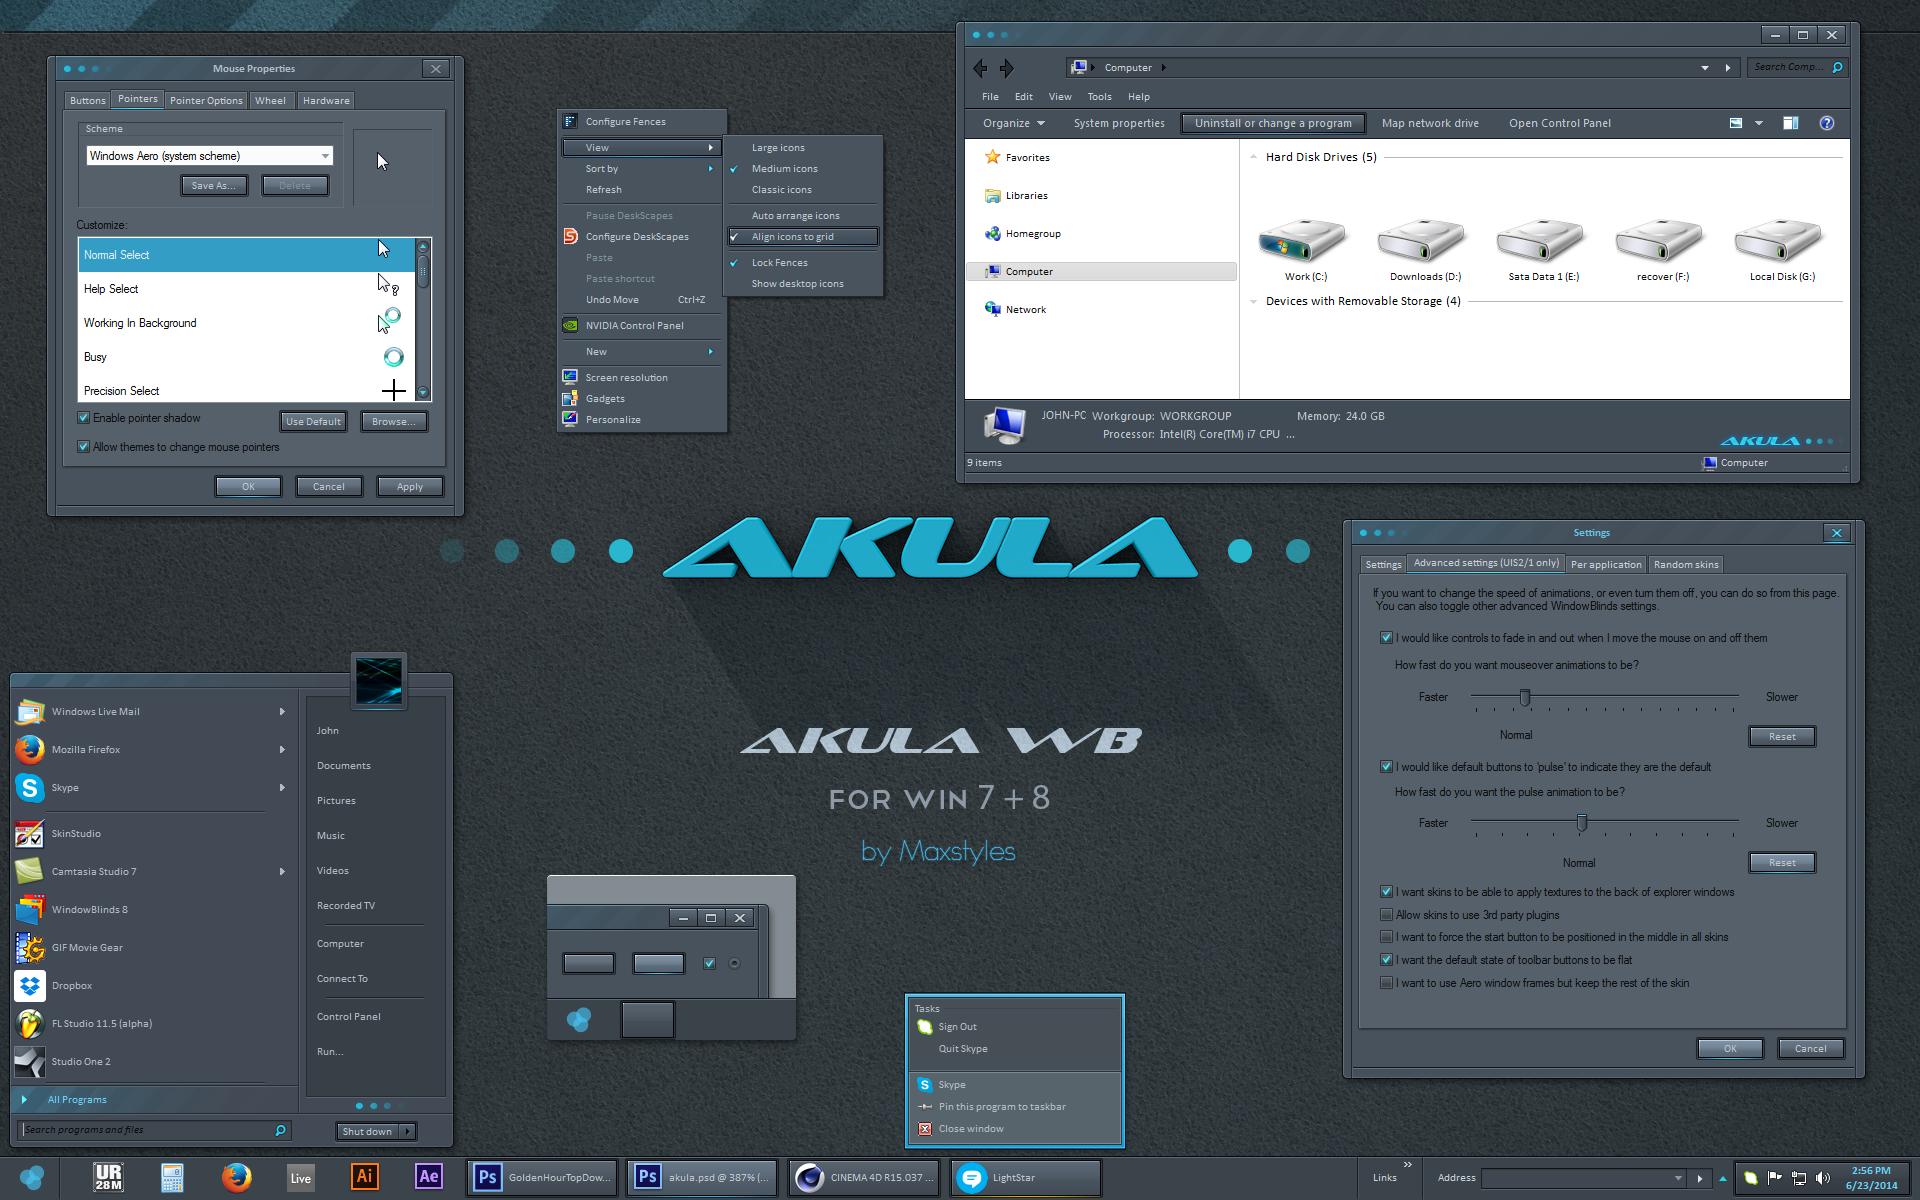 Akula WB for 7 + 8